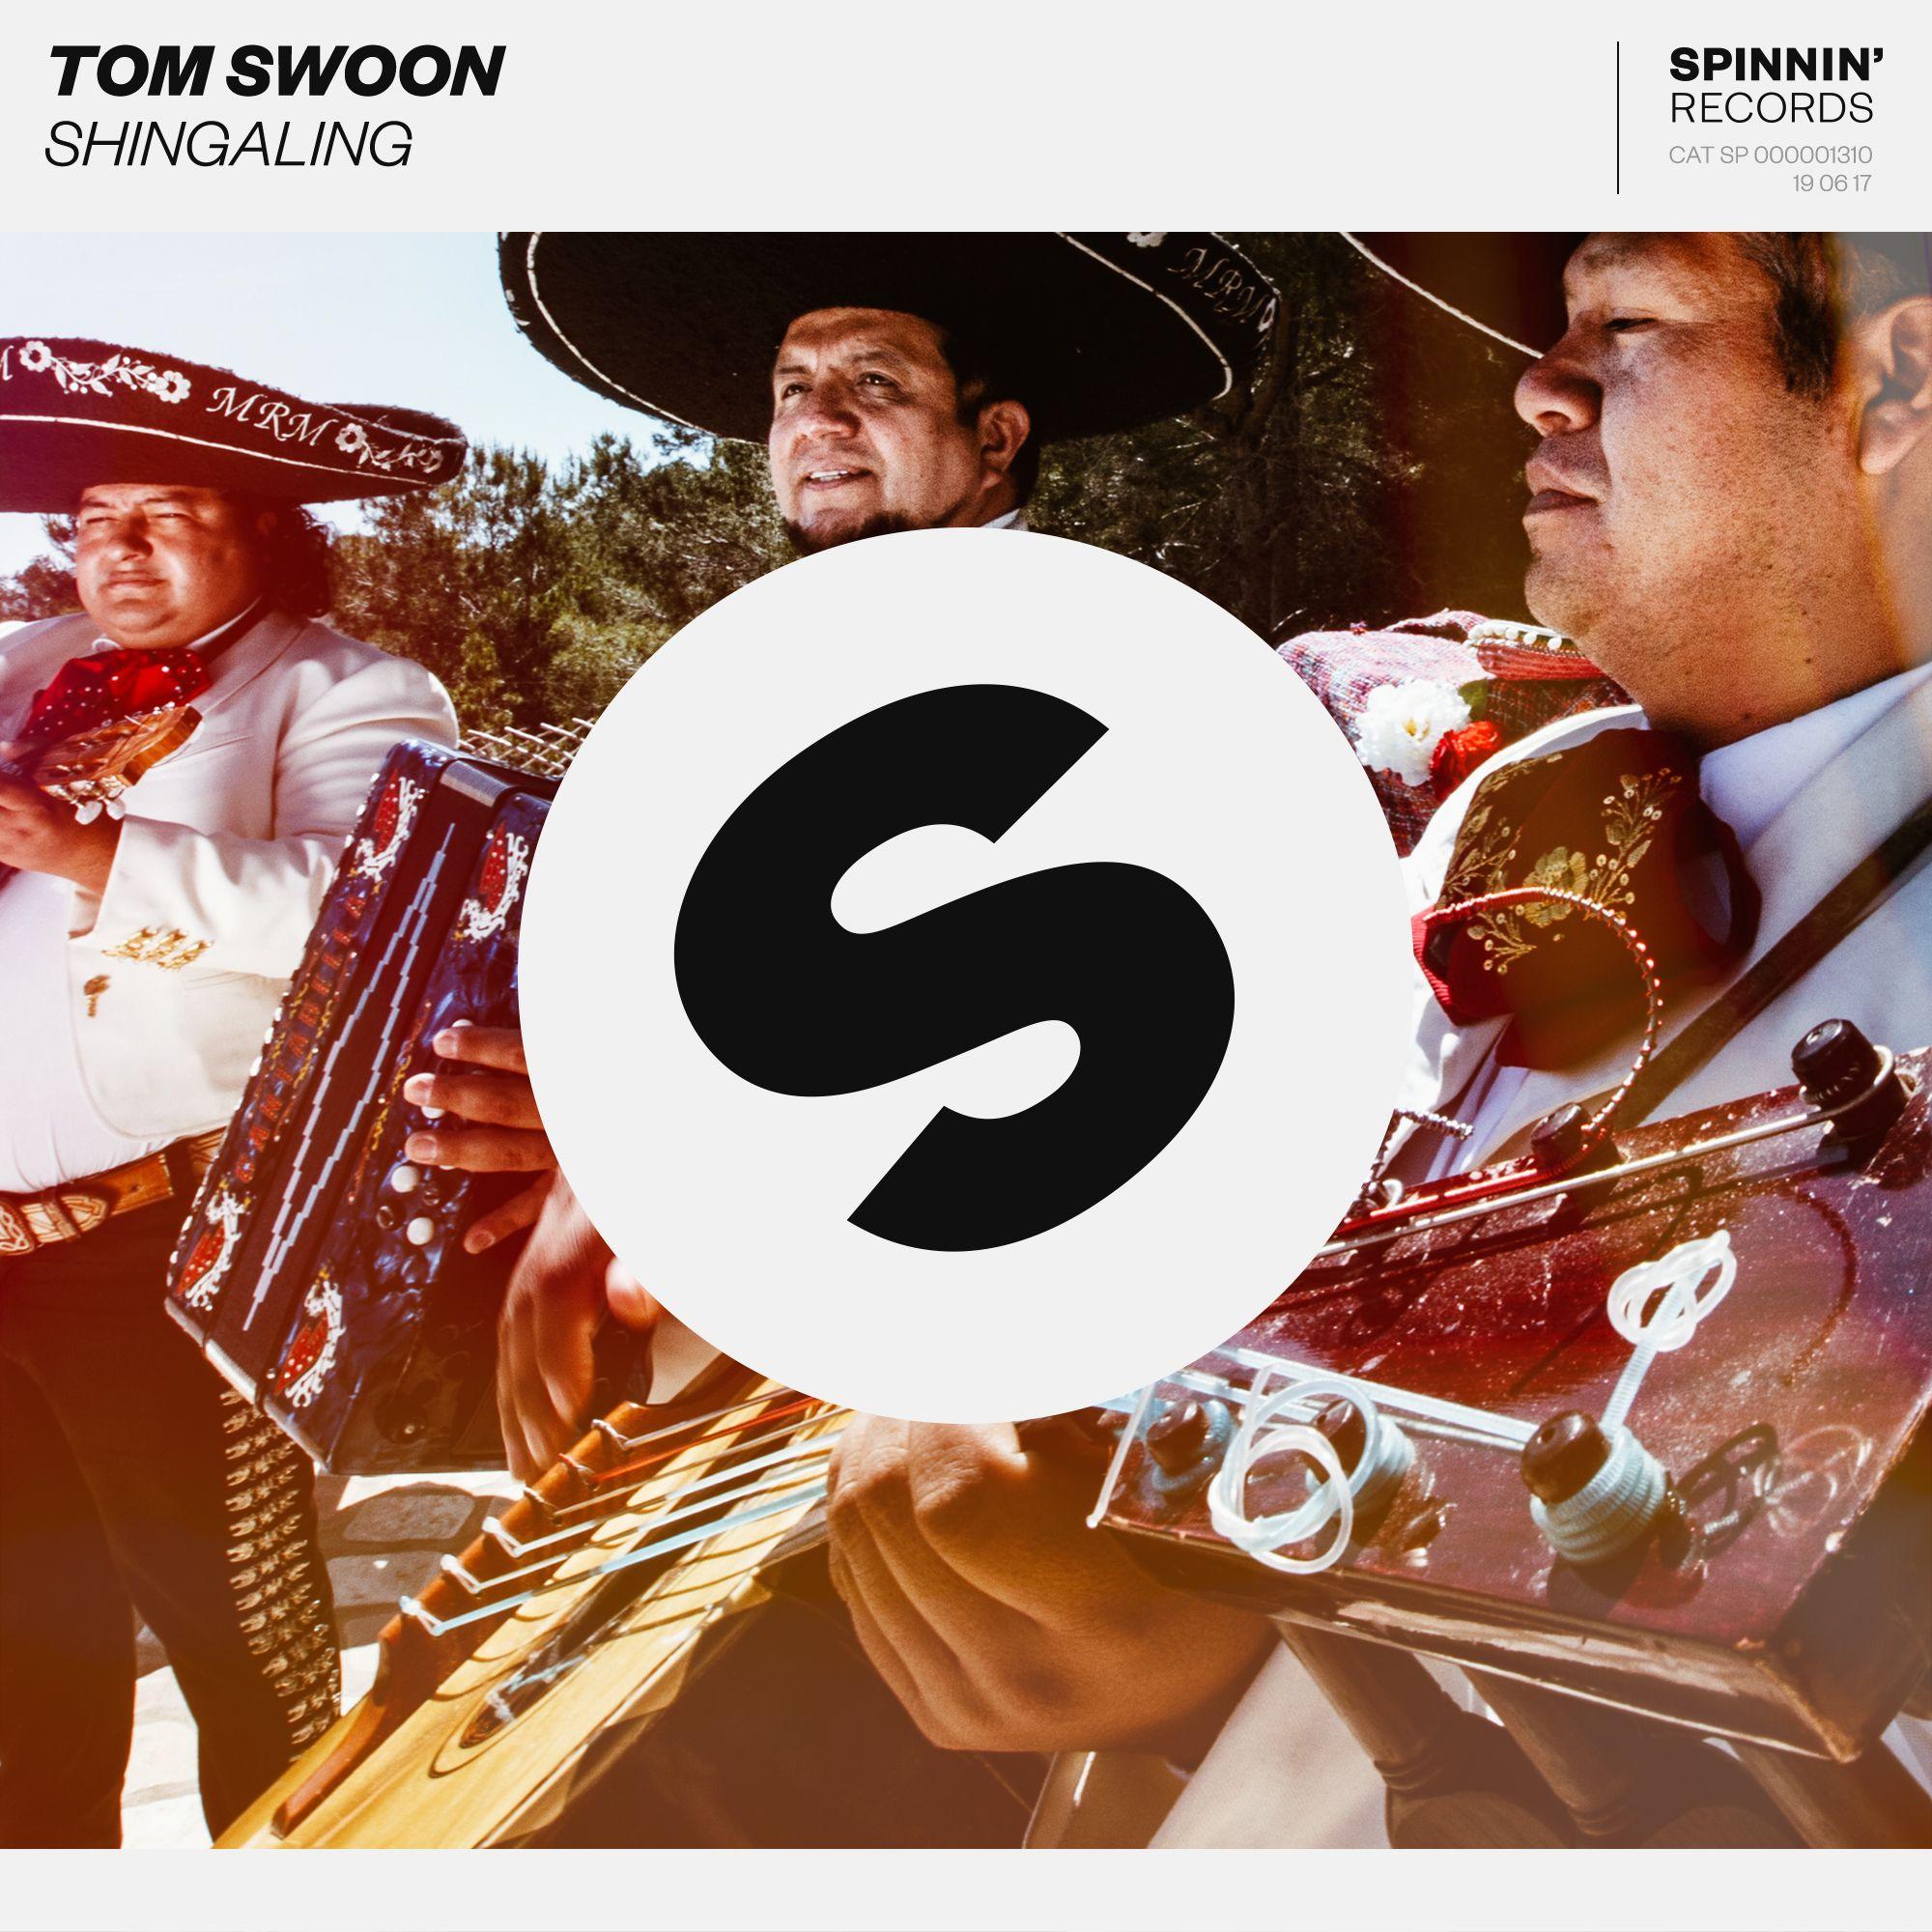 spinnin_tom_swoon_-_shingaling.jpg